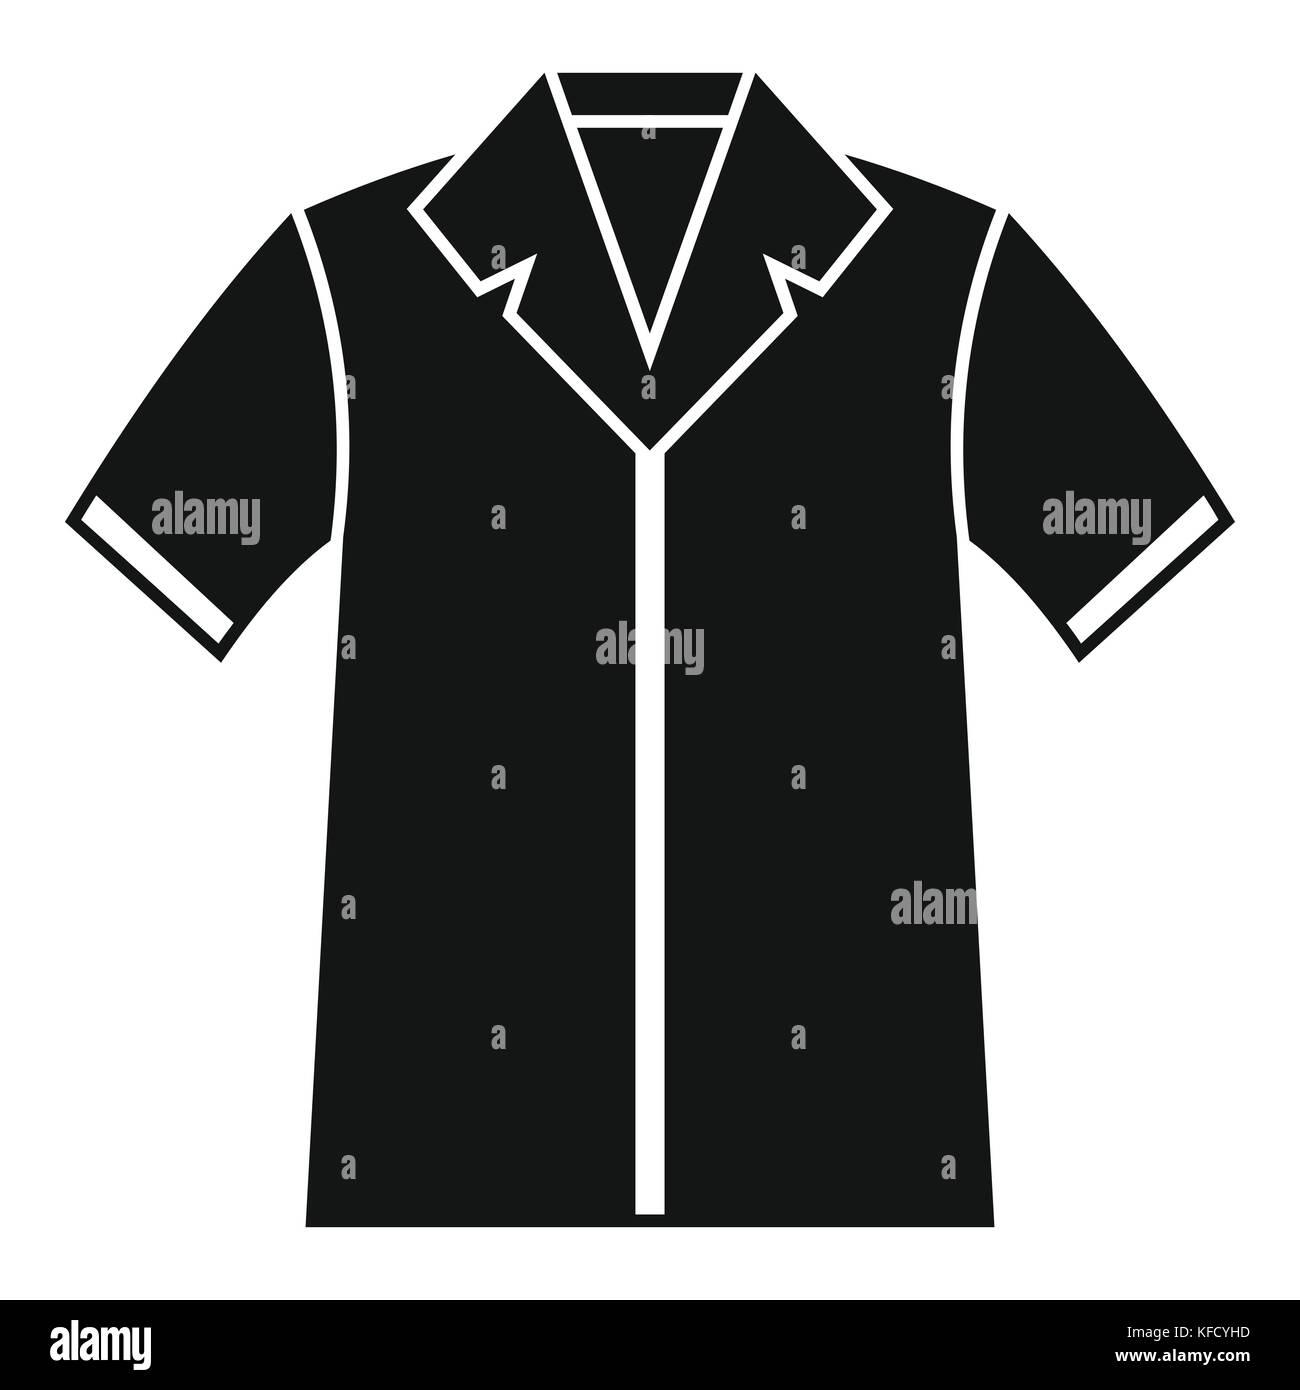 Shirt Polo Icon Simple Style Stock Vector Art Illustration